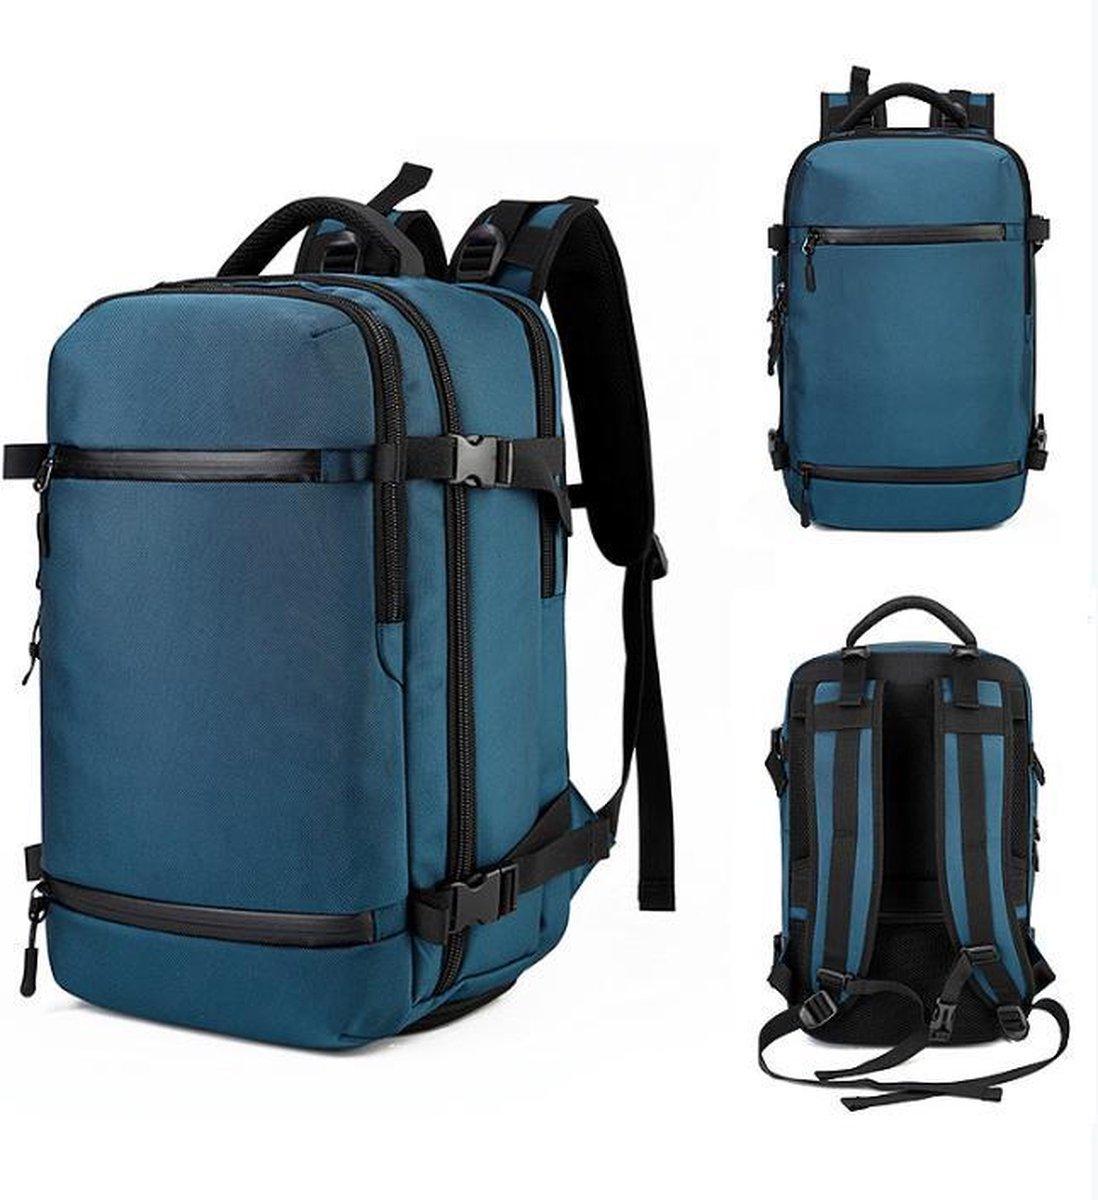 Backpack cabin size blauw petrol  with usb port - Rugzak vliegtuig 51 x 33 x 21 cm - Multifunctionee